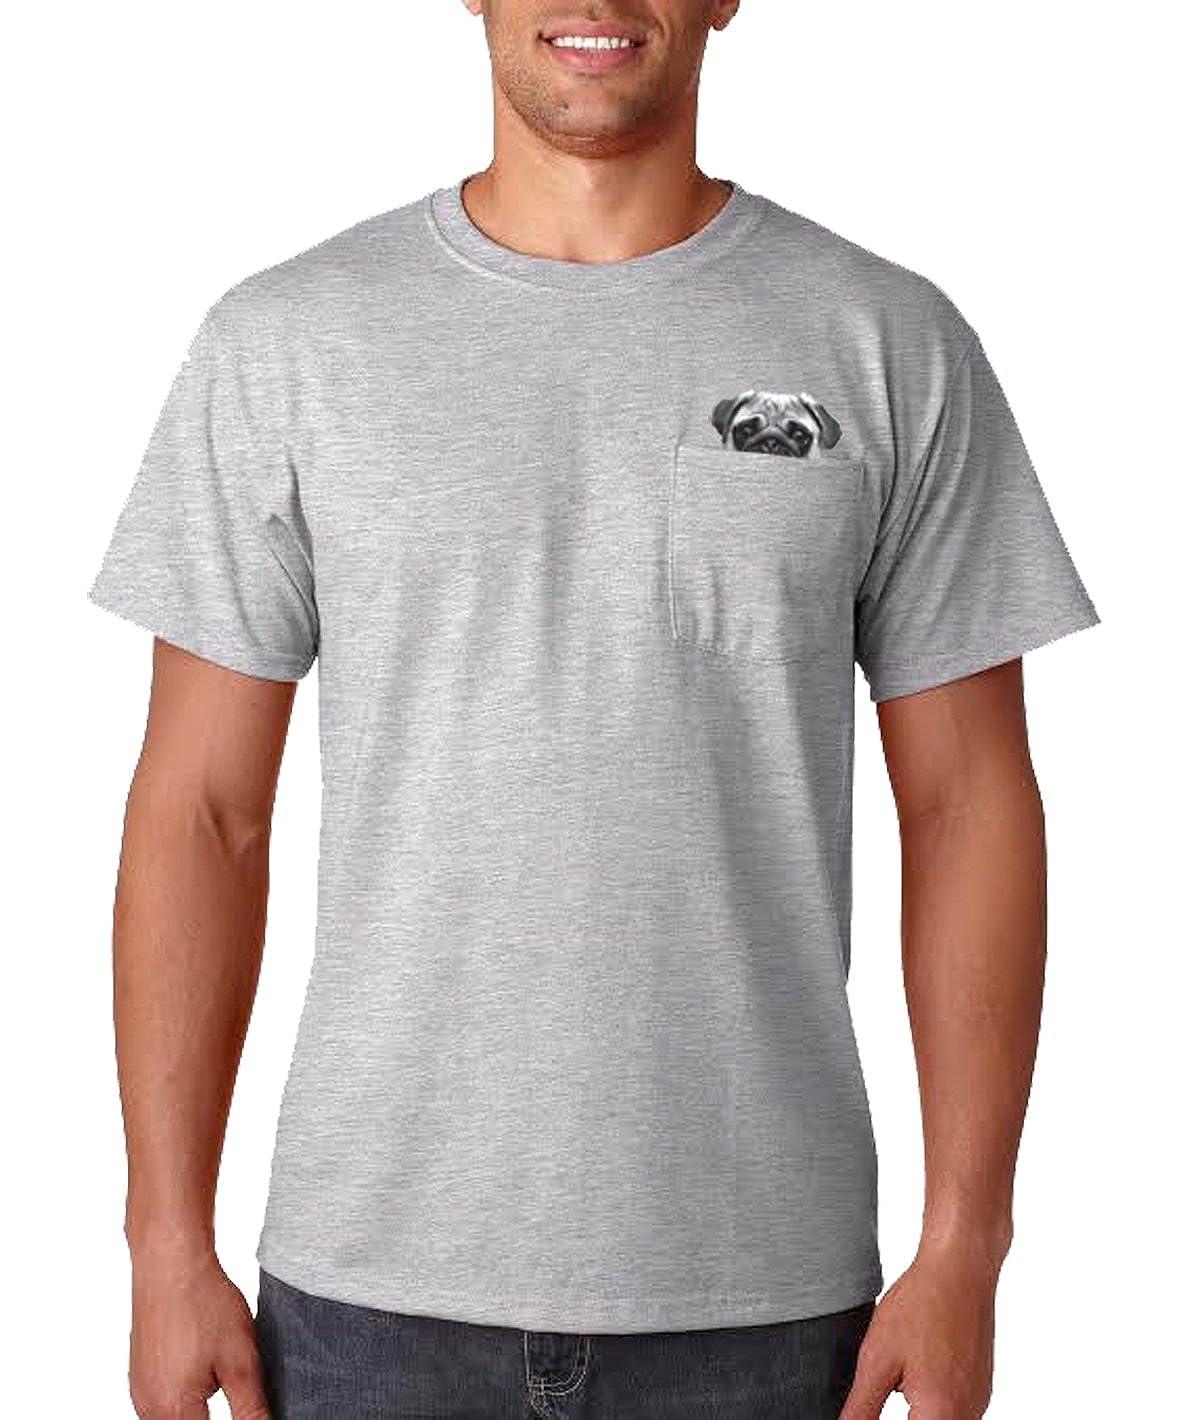 cadd07d11af3 Amazon.com: Mens Pocket Pug Tshirt Funny Cute Pet DogLover Peeking Animal  Tee: Clothing